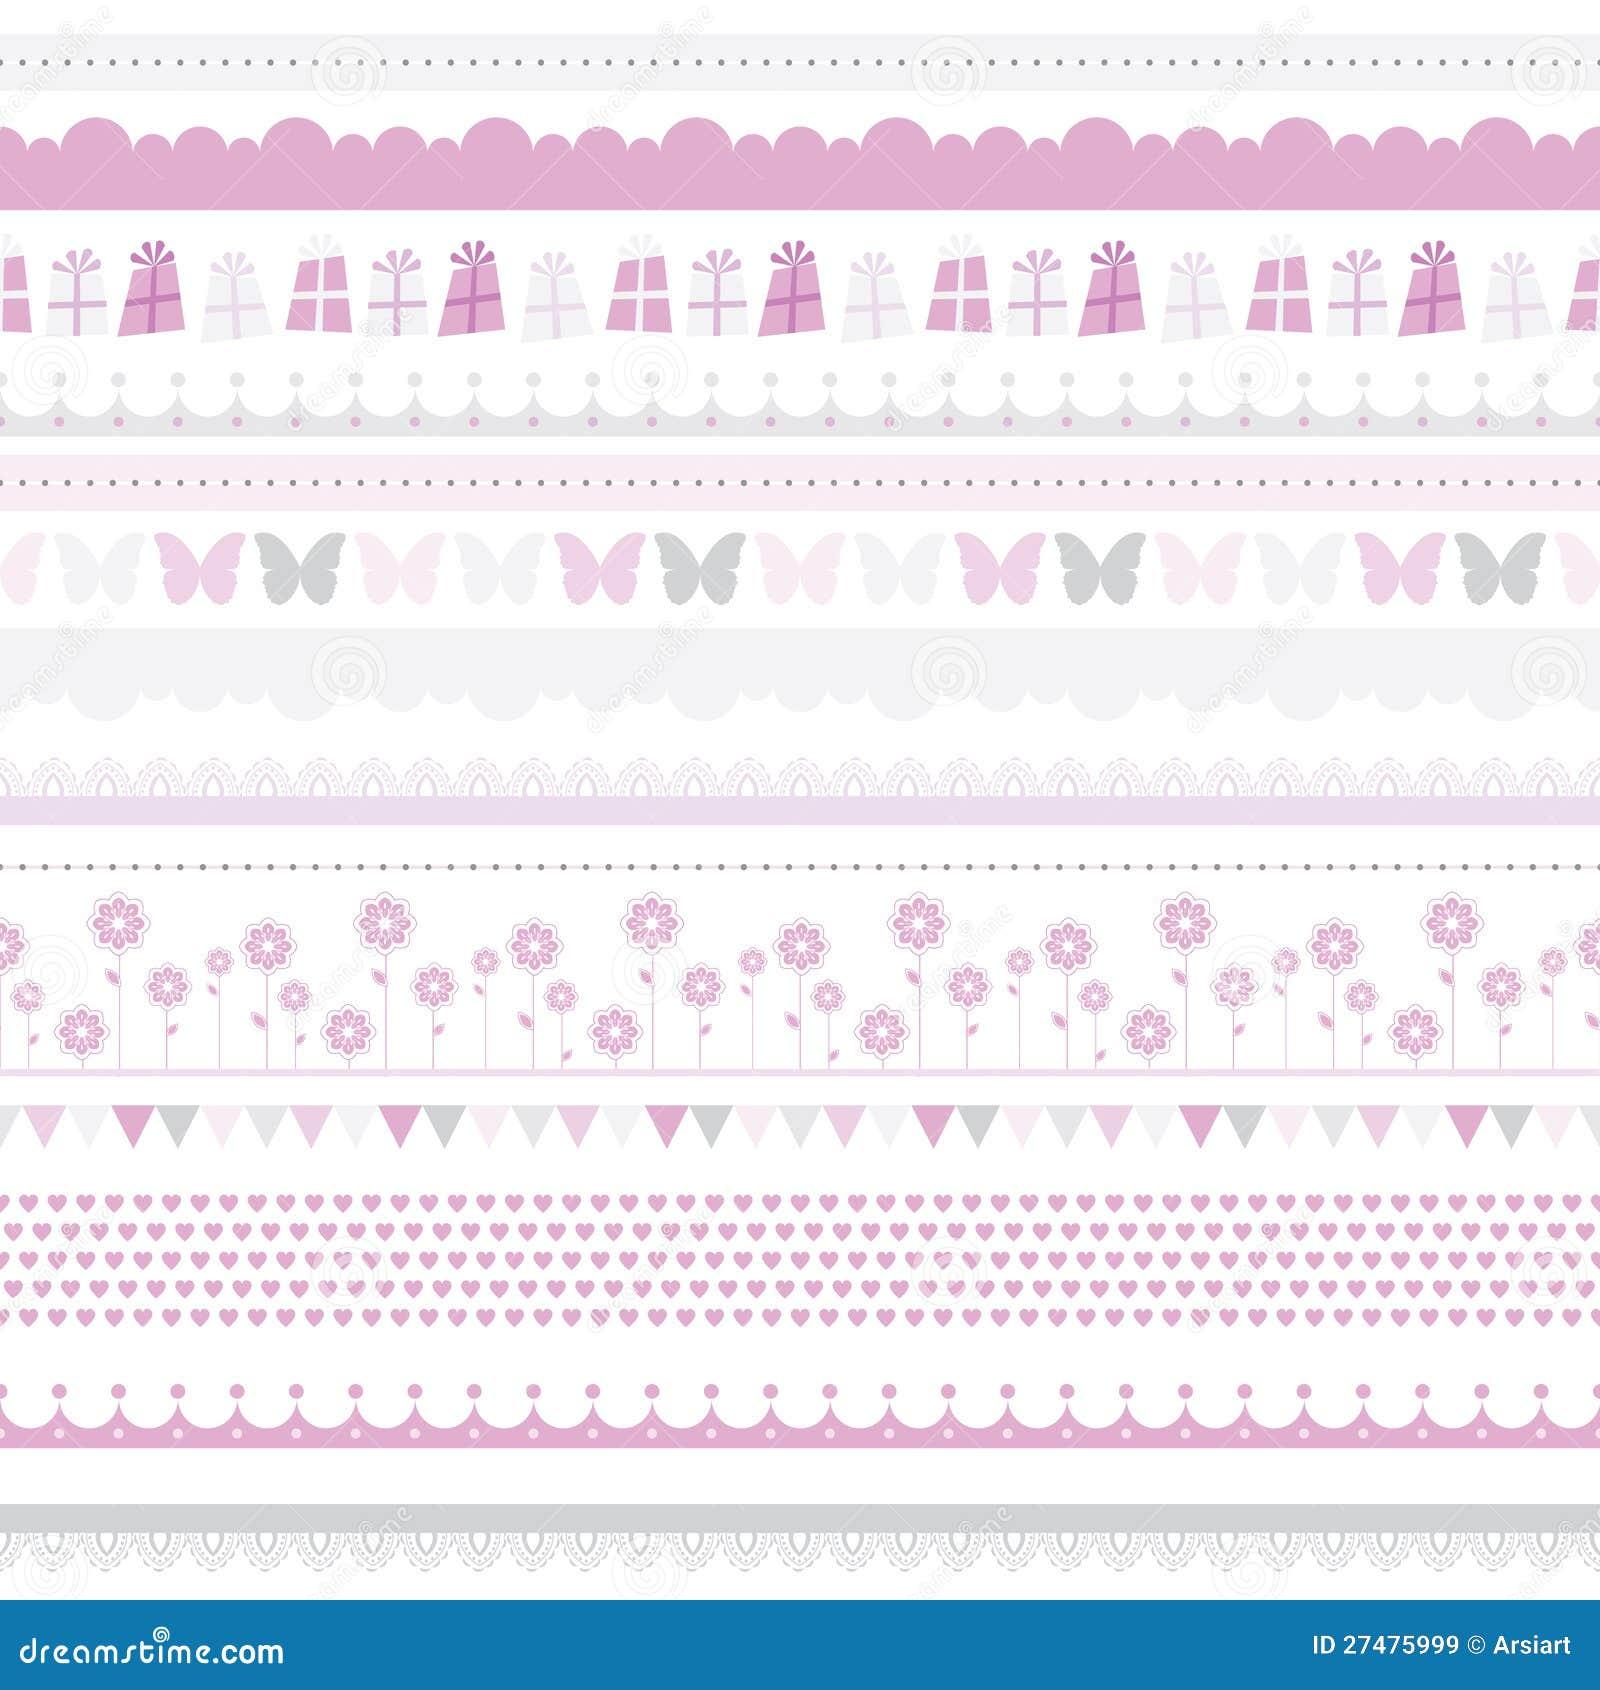 Cute baby seamless border. Child birthday pattern.